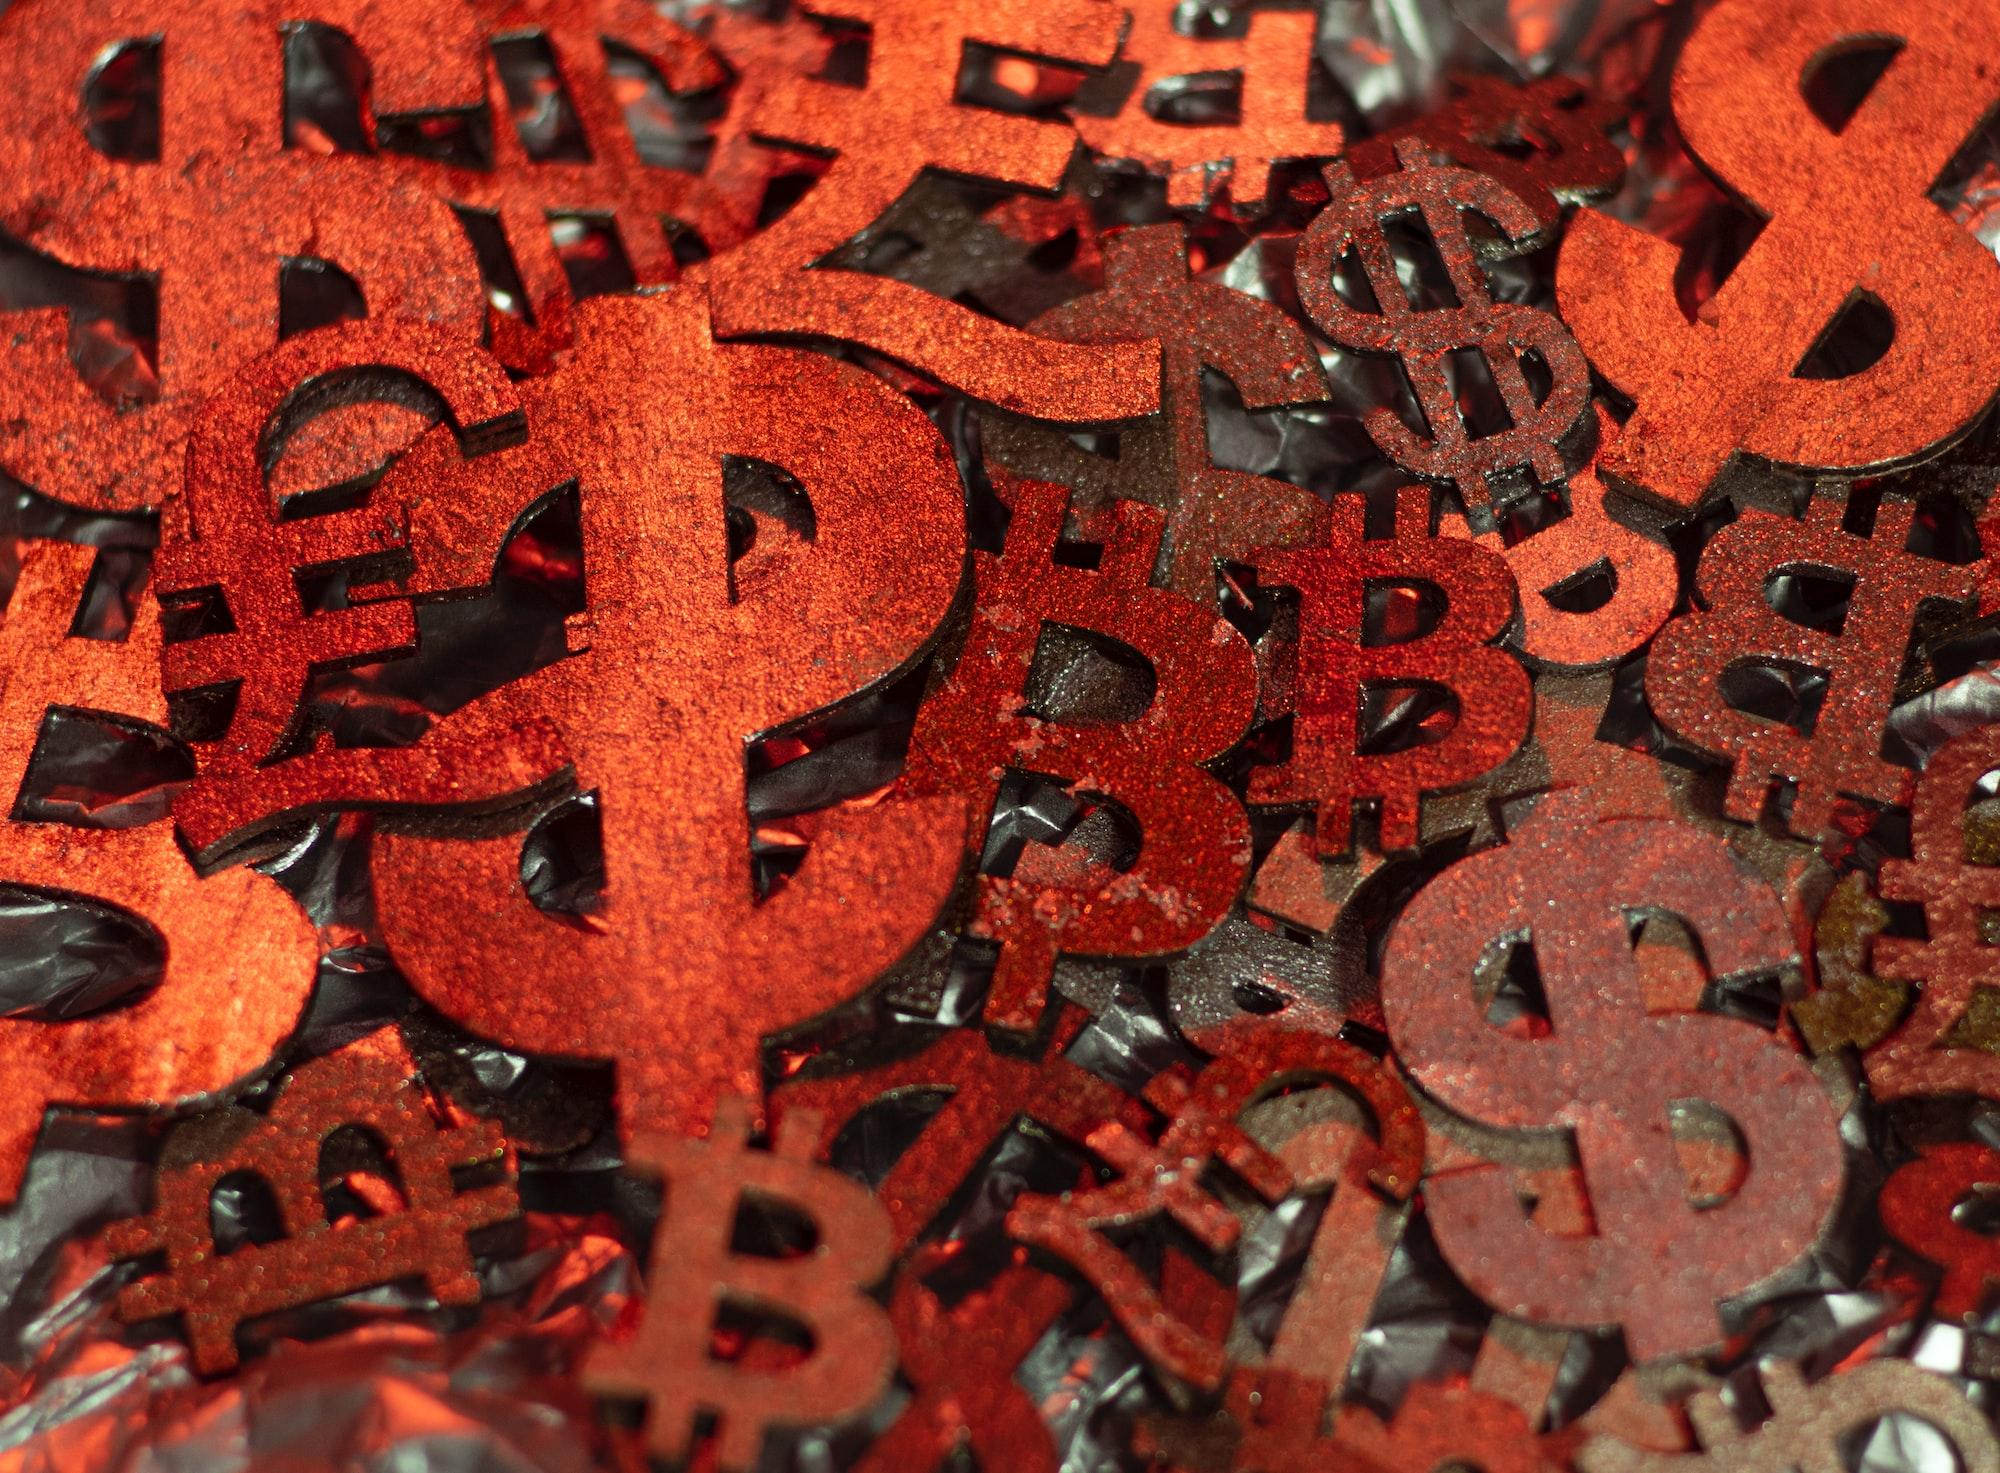 Bitcoin ร่วงลงสู่ราคาต่ำสุดในรอบ 6 สัปดาห์